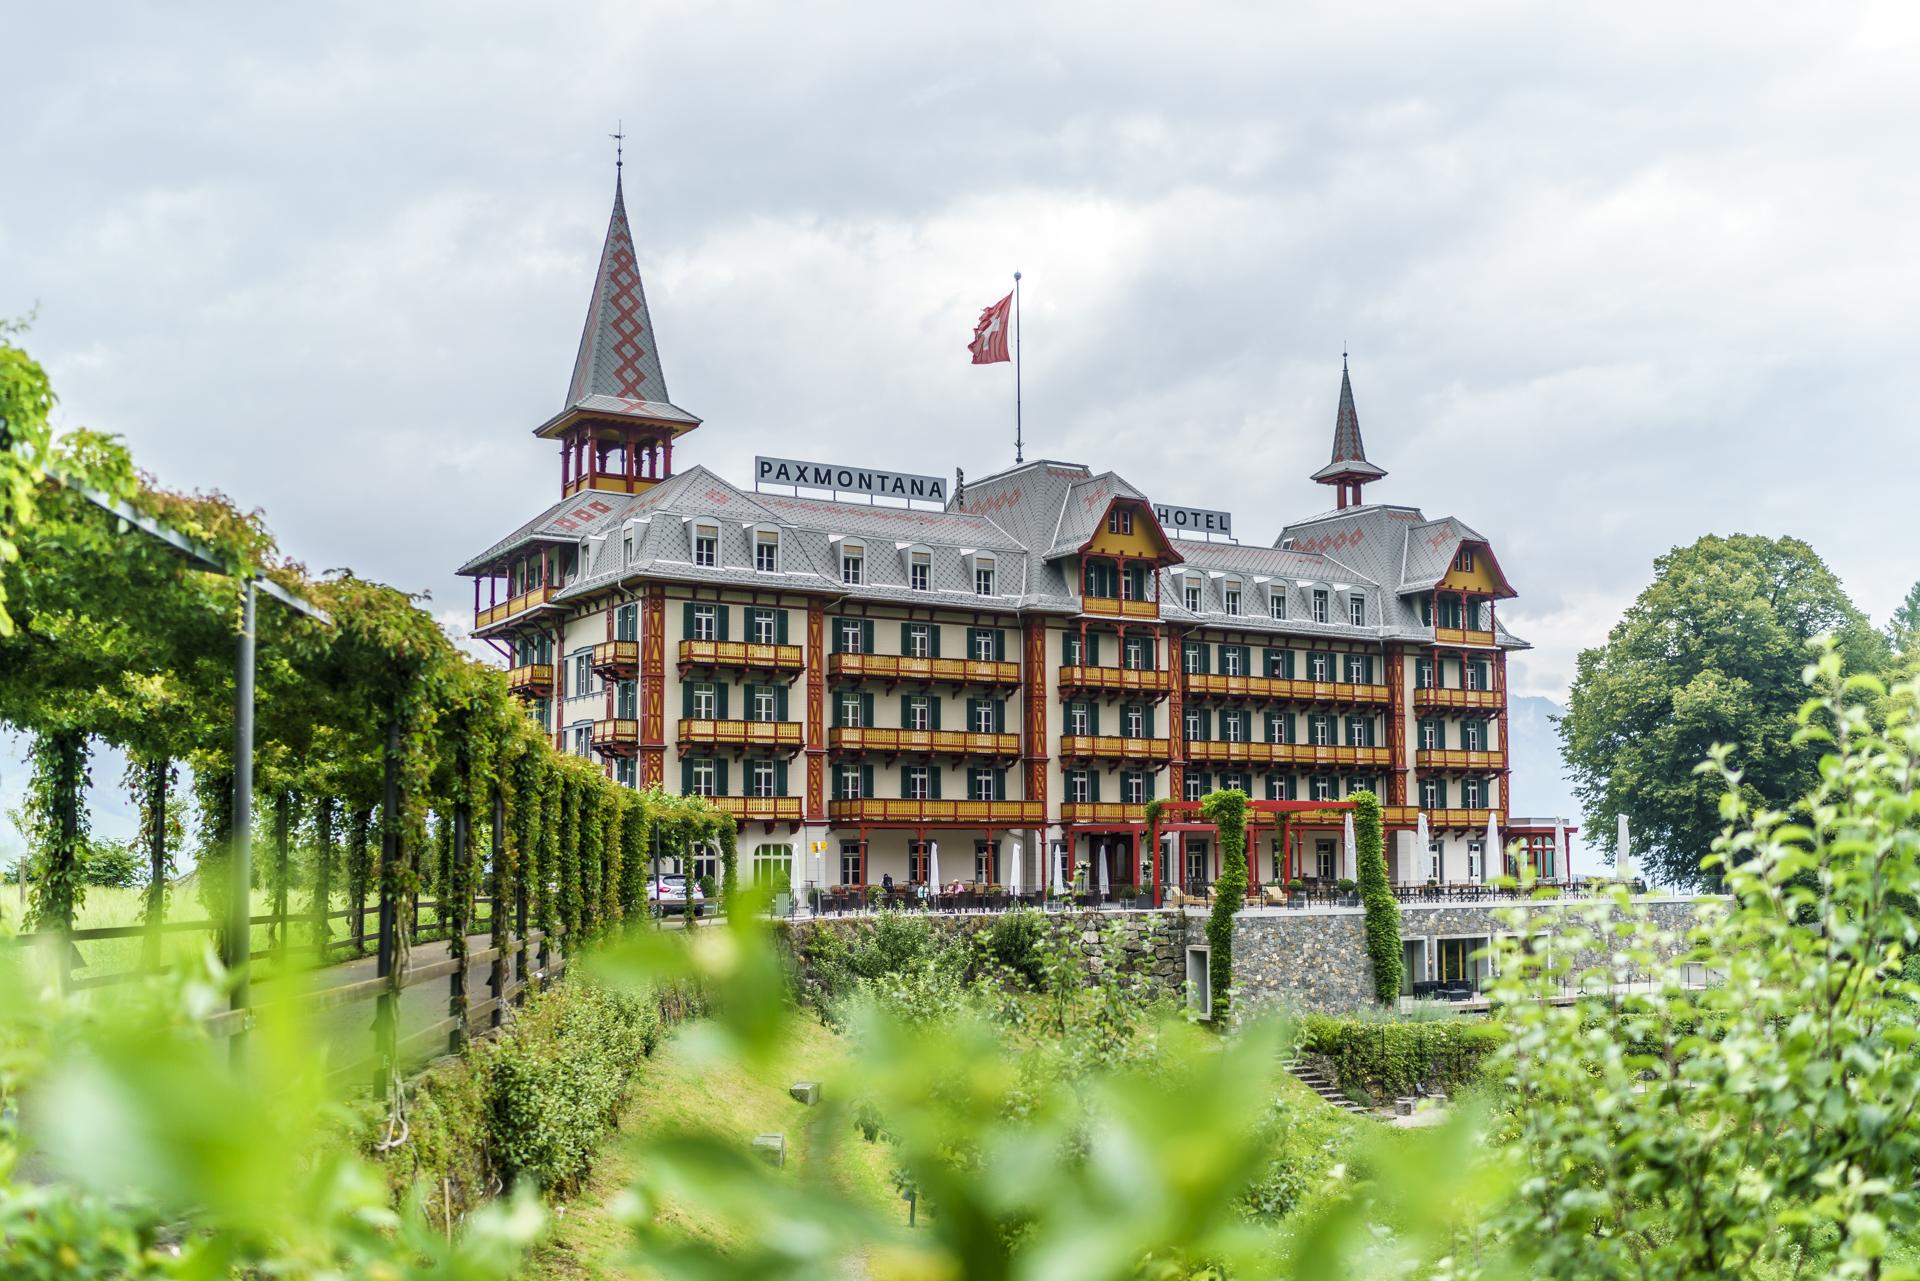 Hotel-Paxmontana-Flueli-Ranft